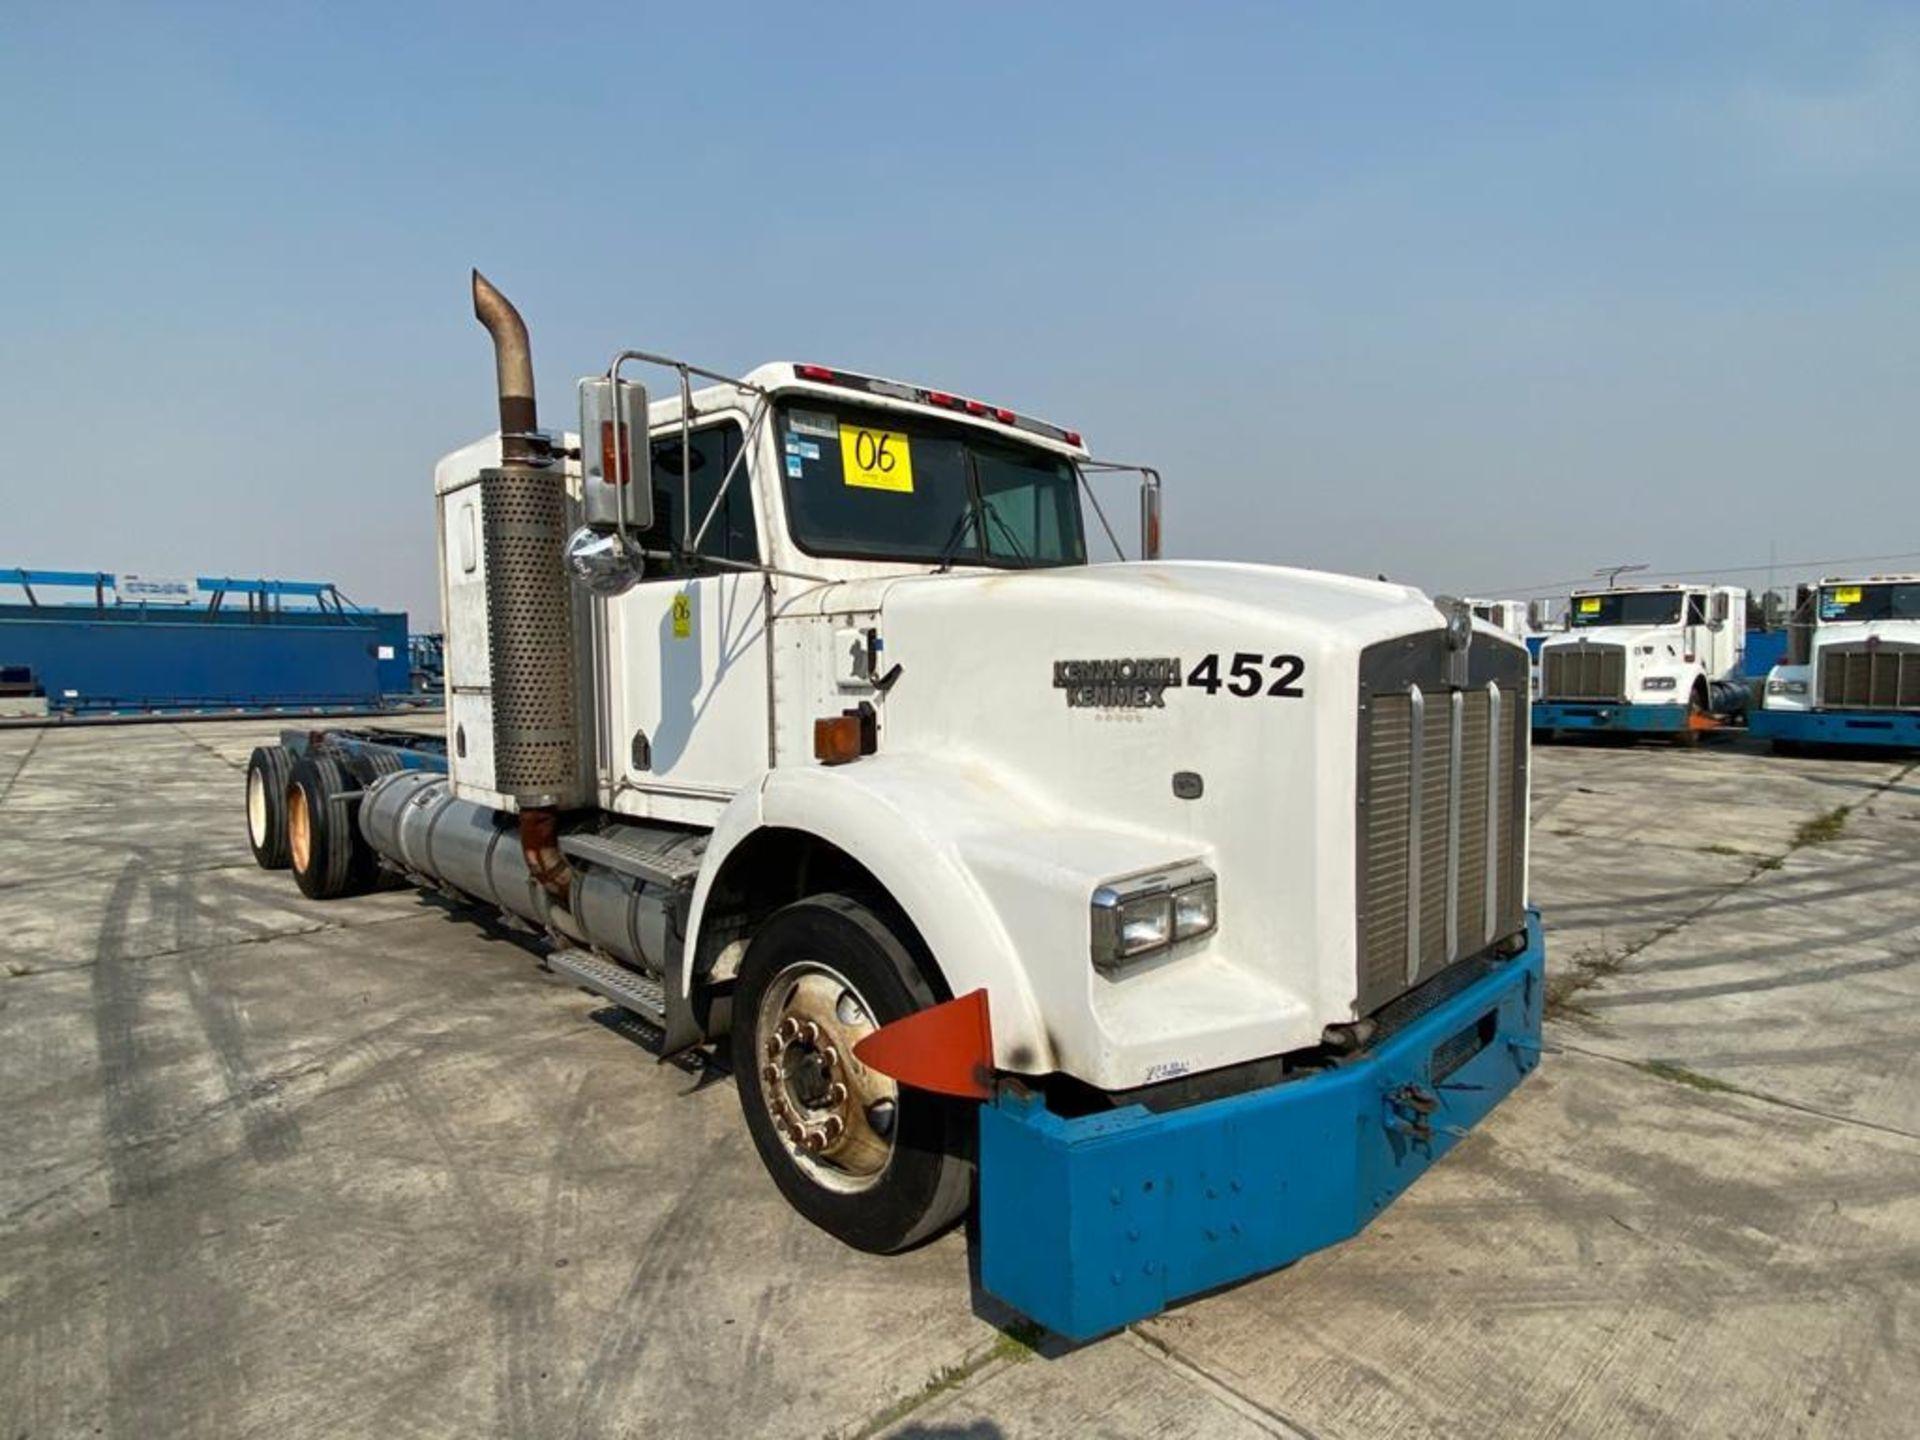 1998 Kenworth Sleeper truck tractor, standard transmission of 18 speeds - Image 3 of 75